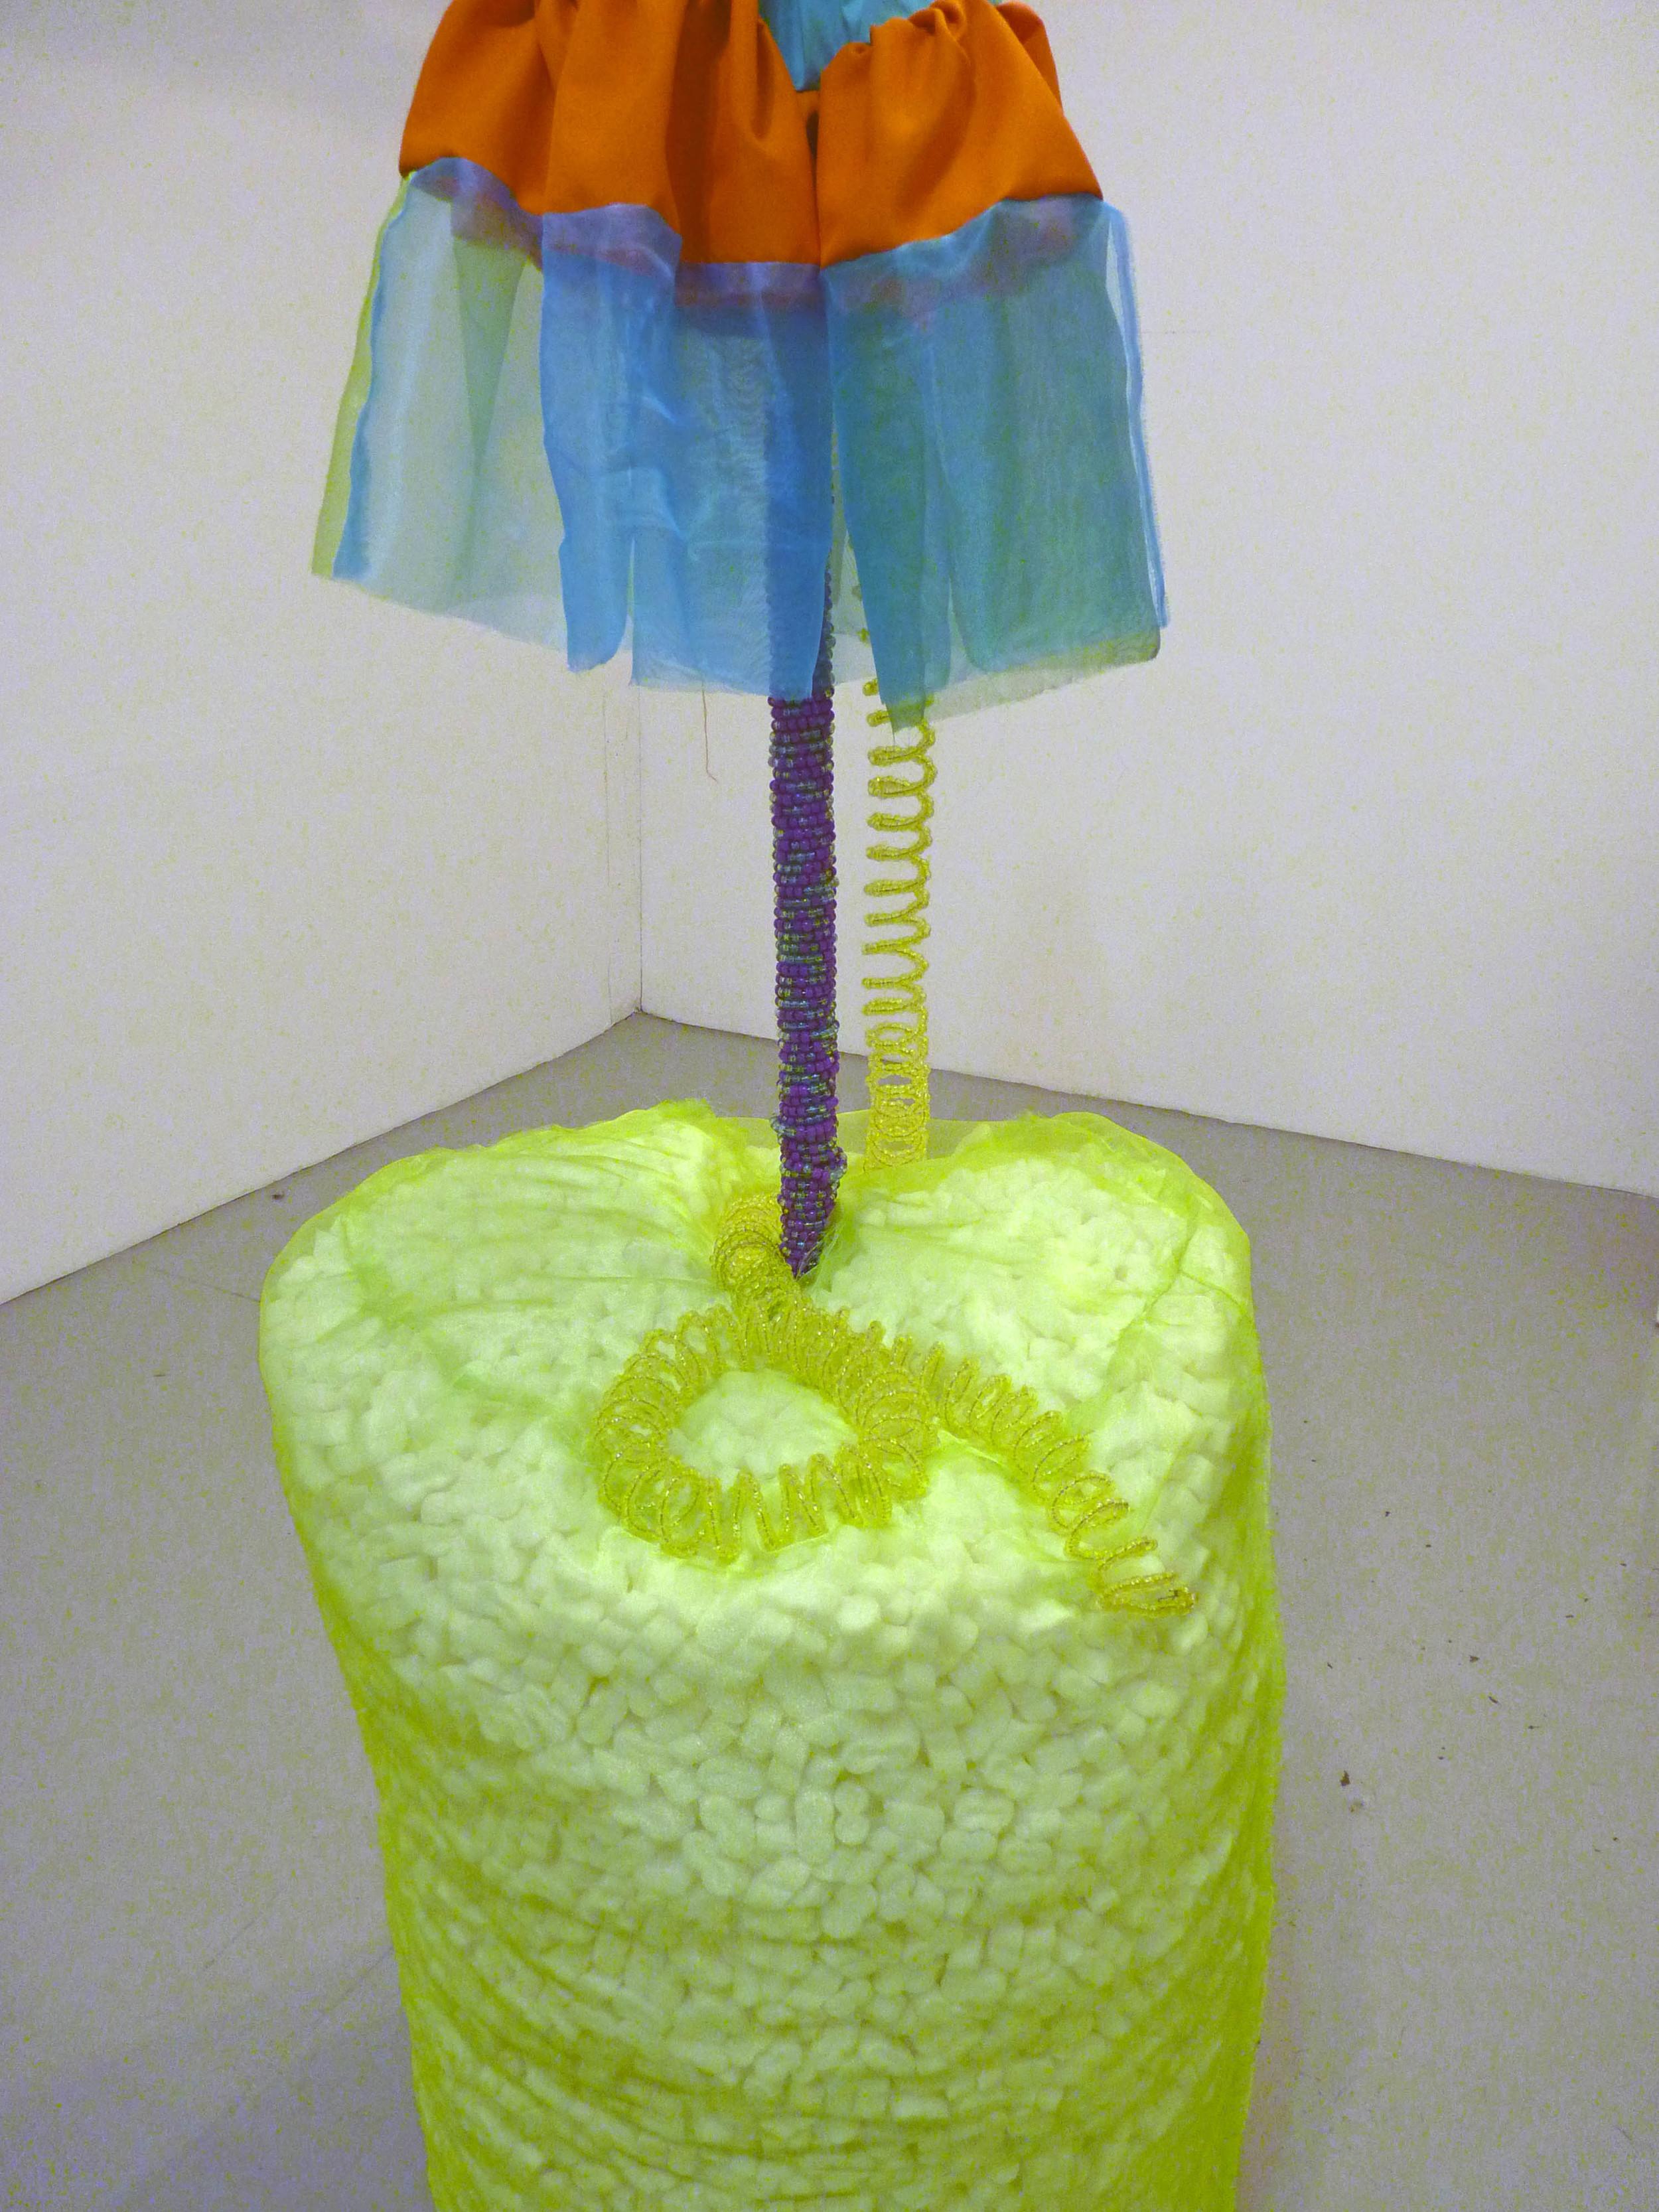 Untitled (Tankini), 2014, Fabric, metal, plastic beads, styrofoam and wood, 3' x 8' (detail)